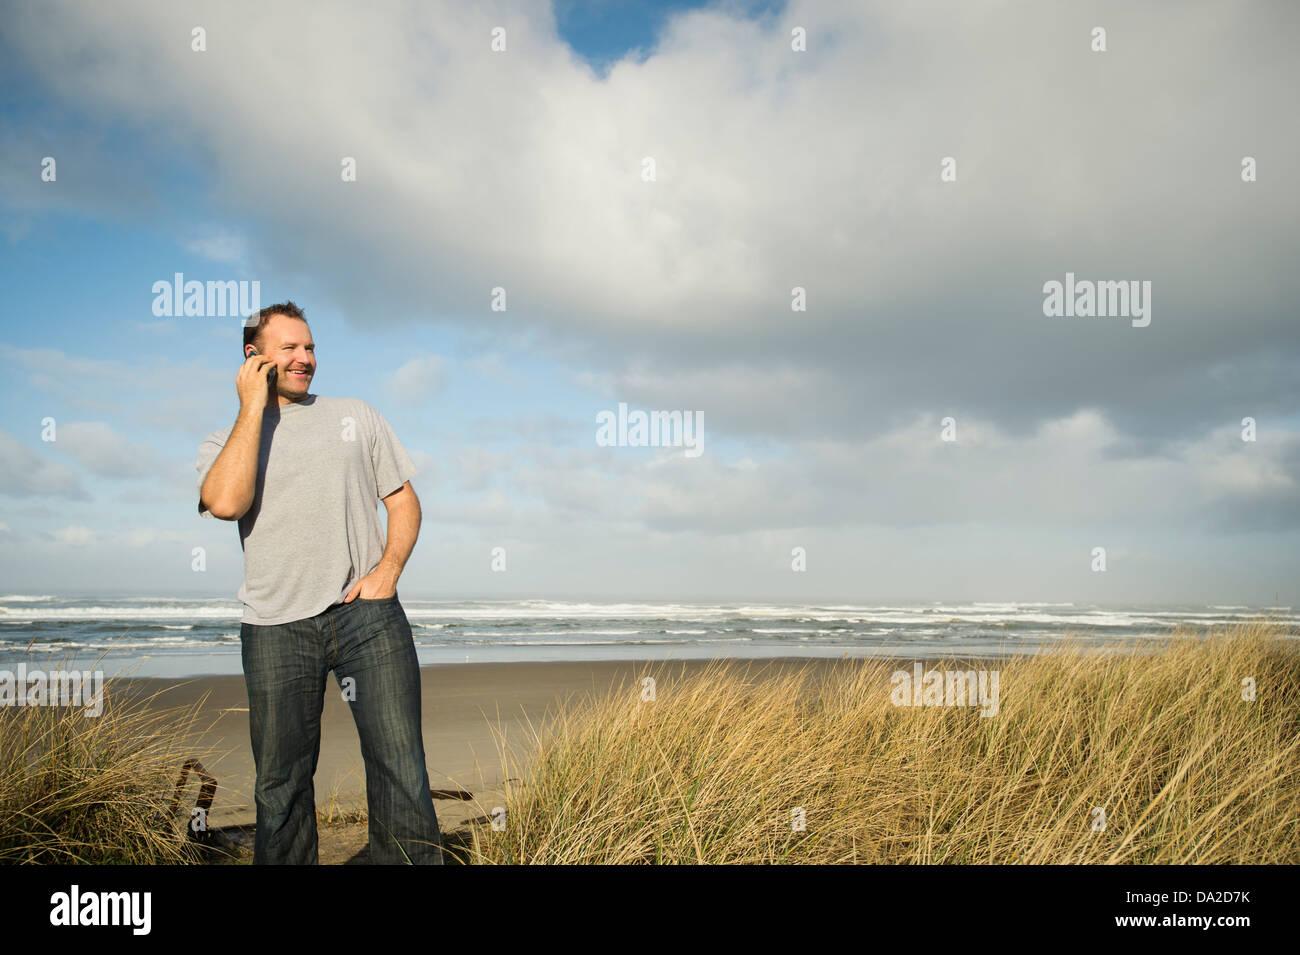 USA, Oregon, Rockaway Beach, Man on phone while standing on beach Stock Photo